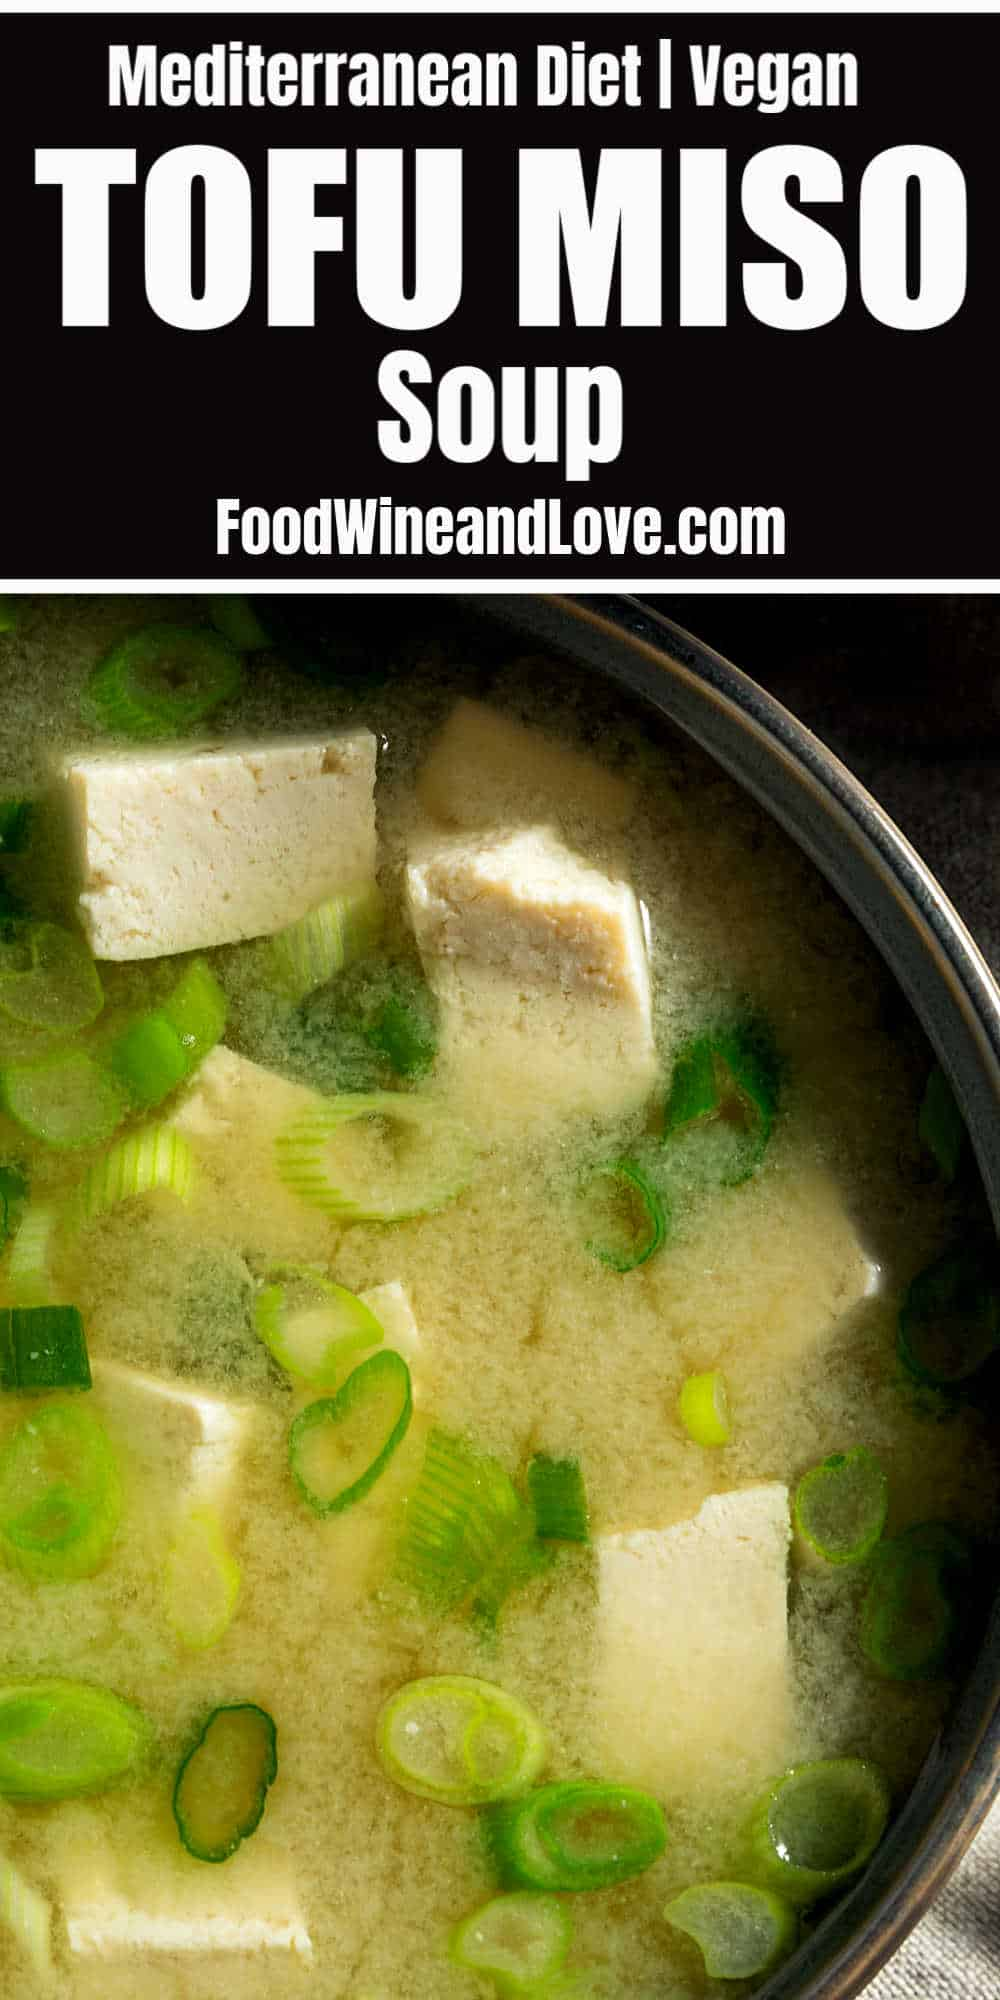 Amazing Tofu Miso Soup